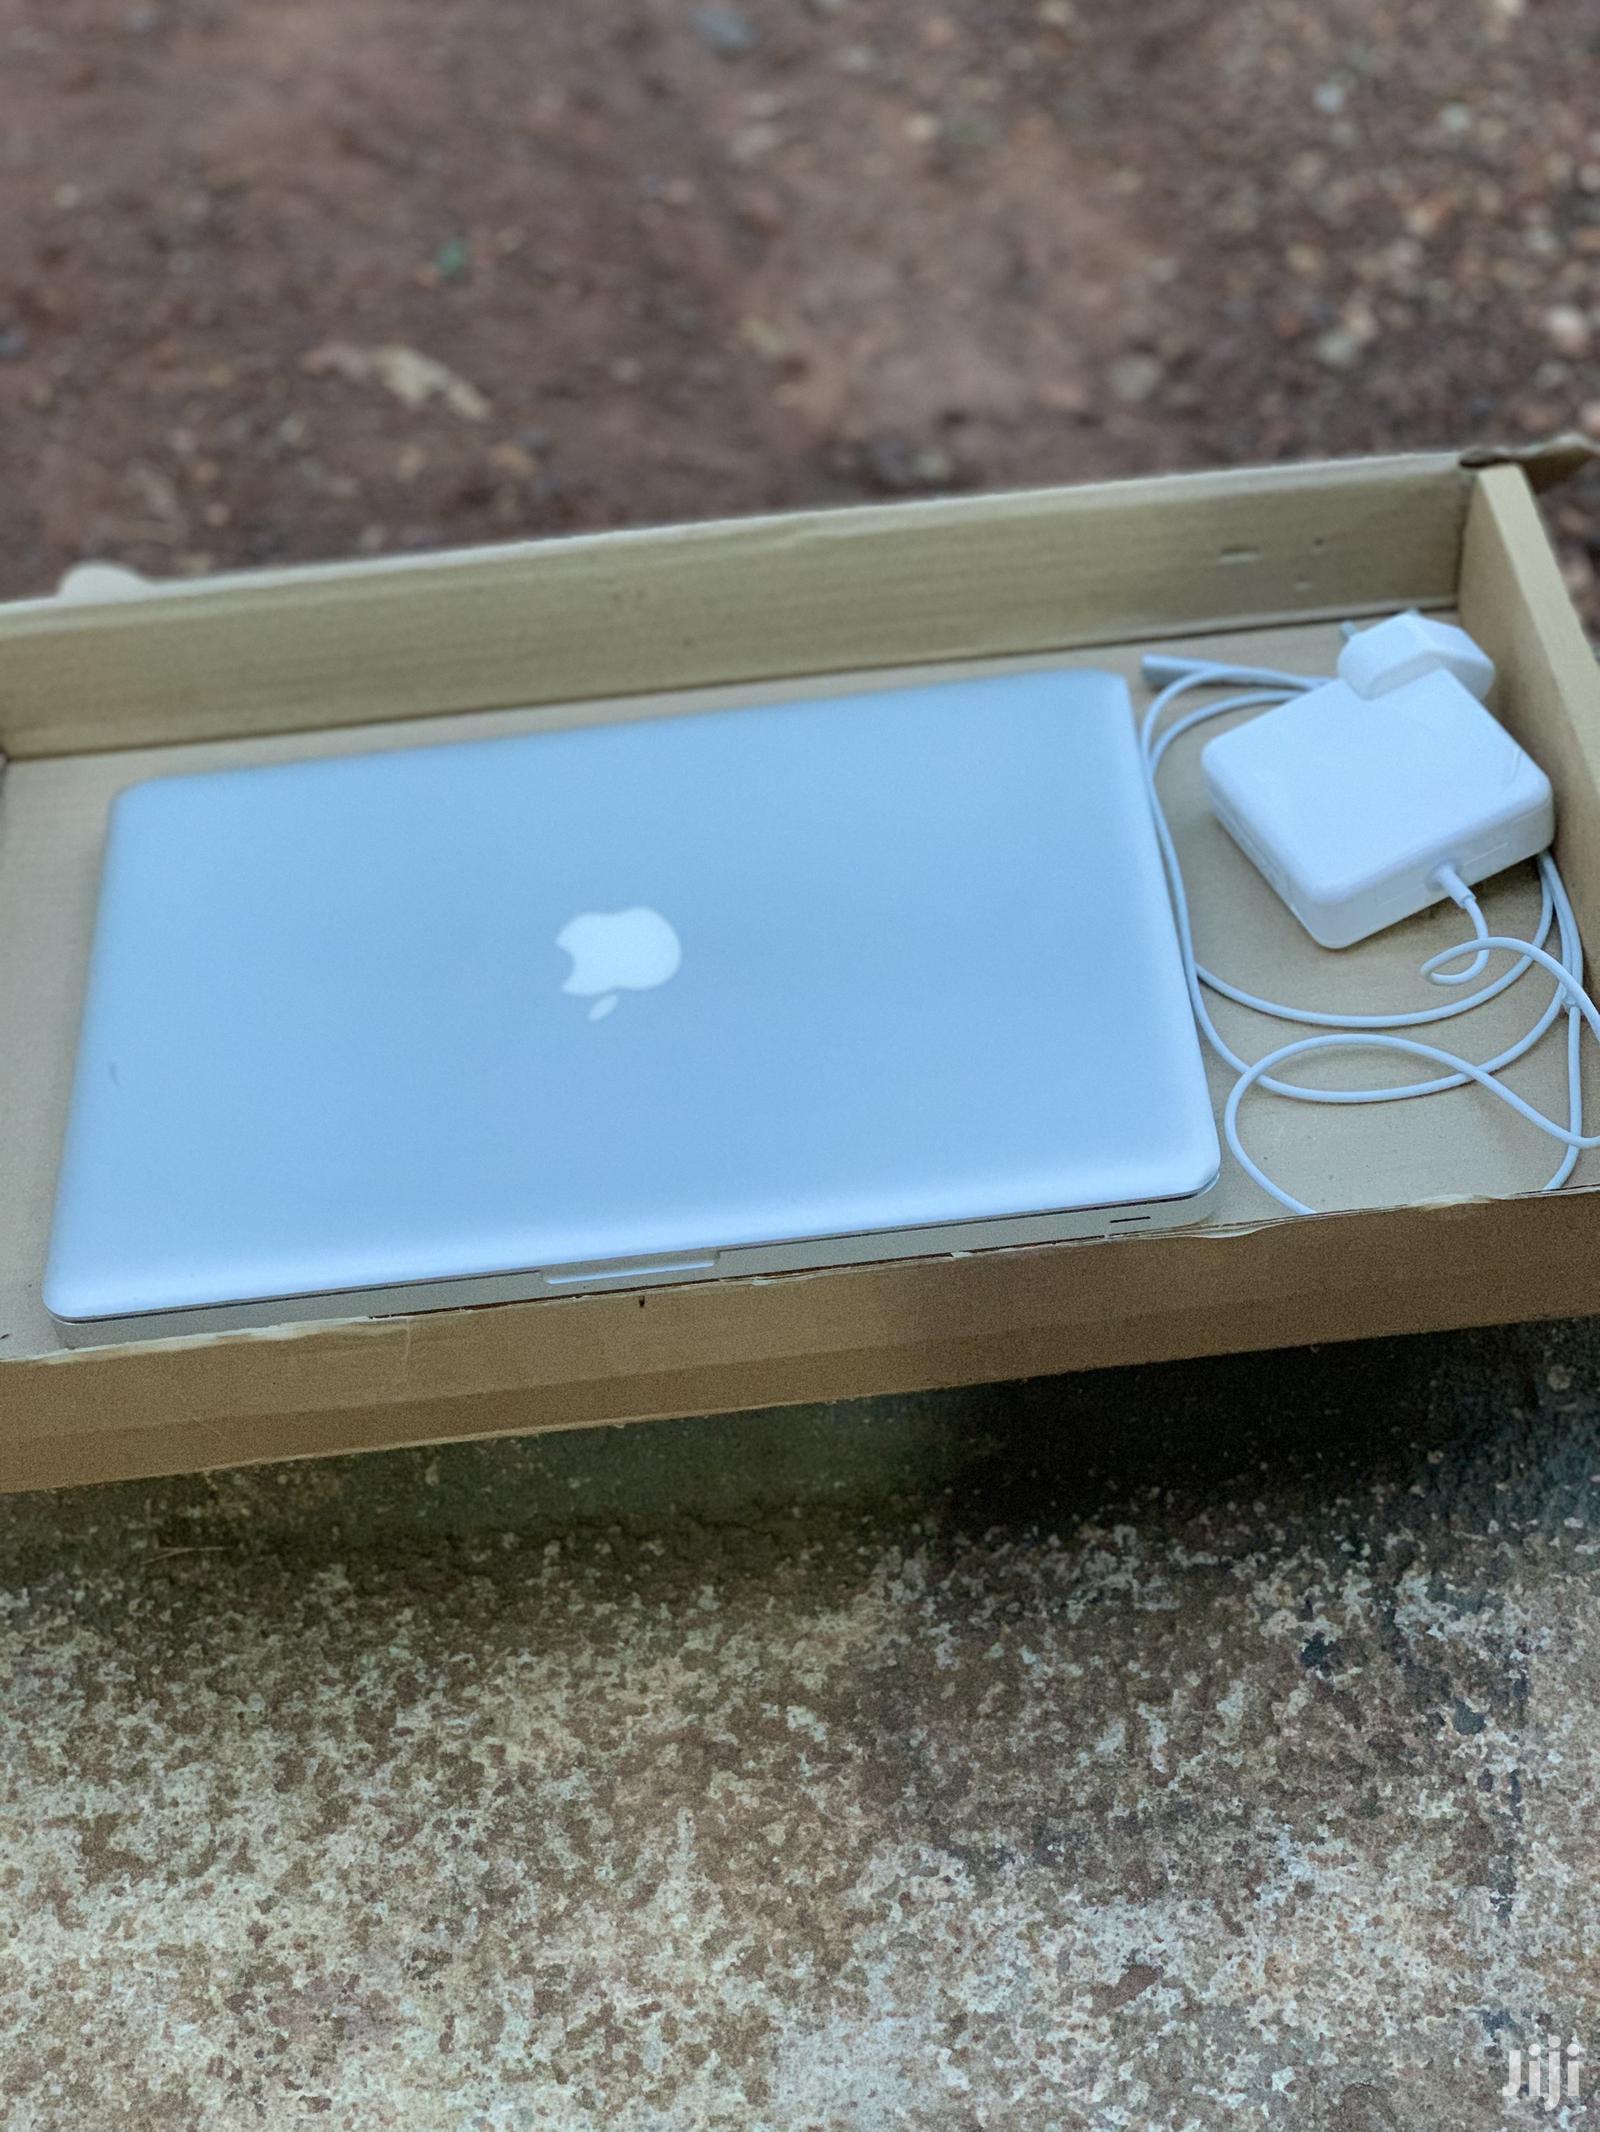 Laptop Apple MacBook 2010 4GB Intel Core 2 Duo HDD 320GB | Laptops & Computers for sale in Kumasi Metropolitan, Ashanti, Ghana